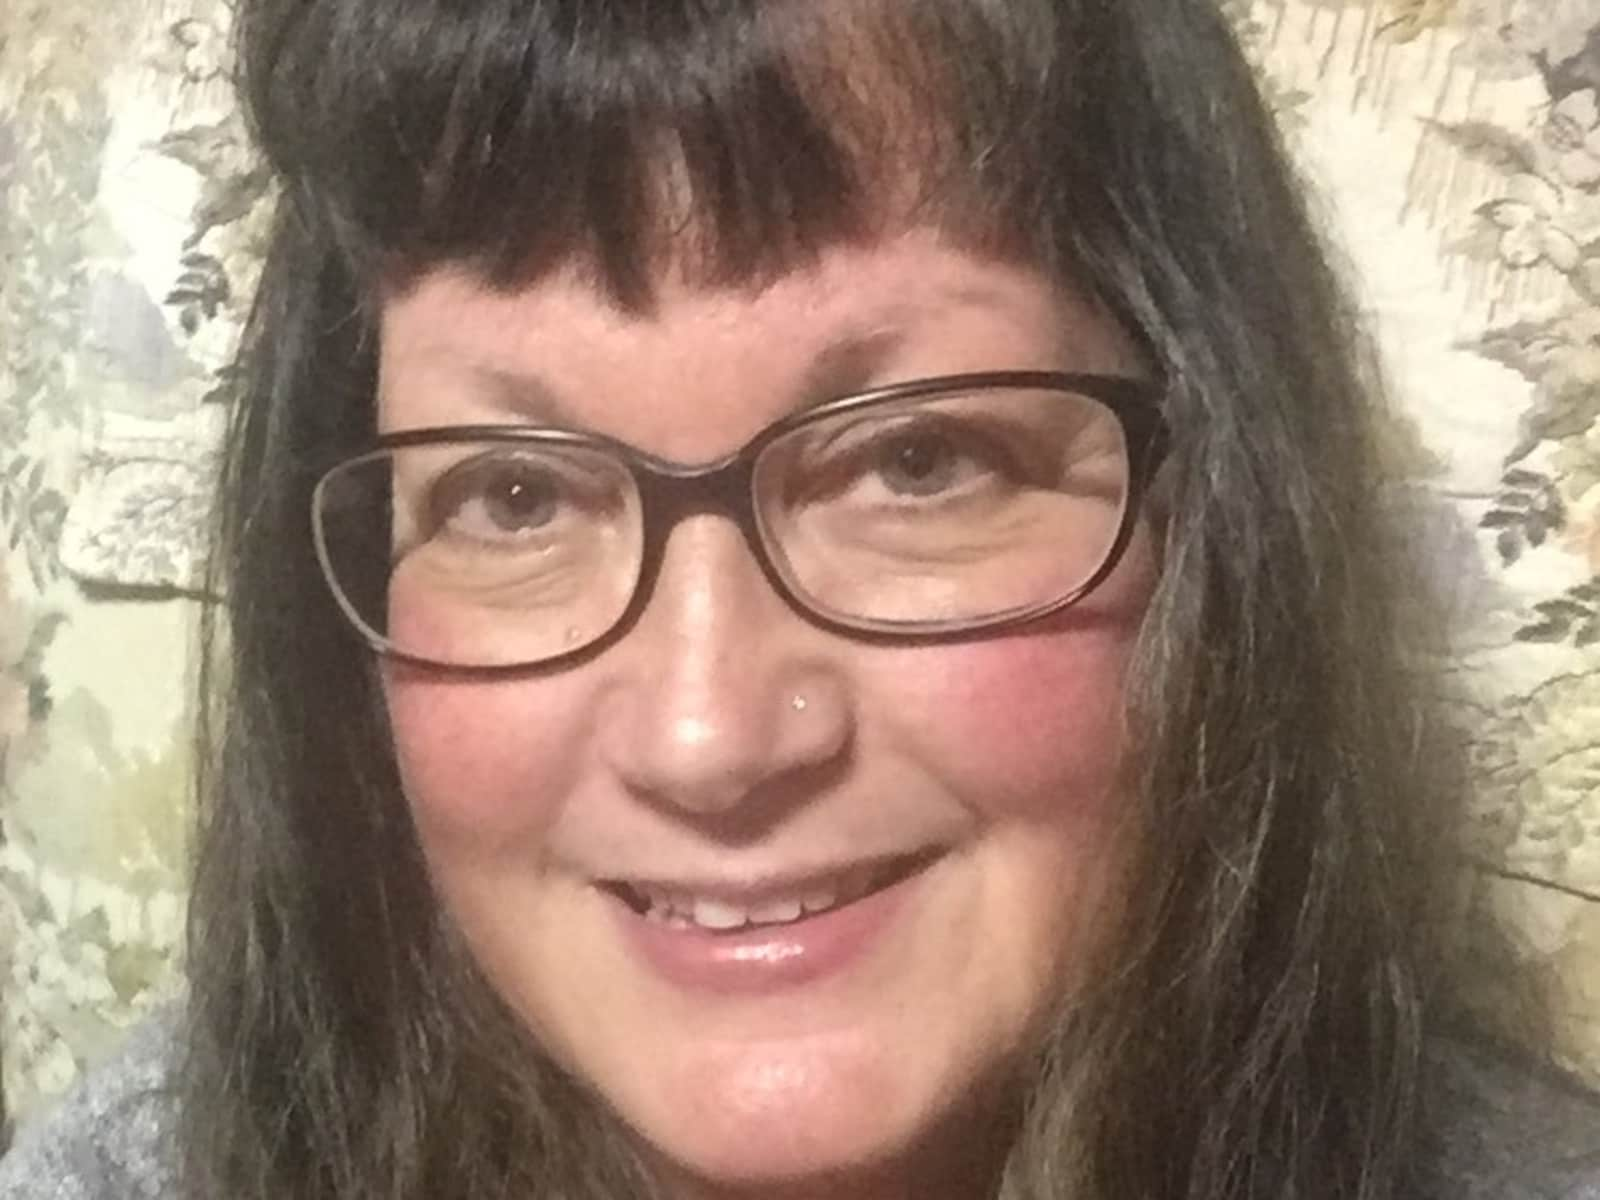 Rachel from Roseburg, Oregon, United States